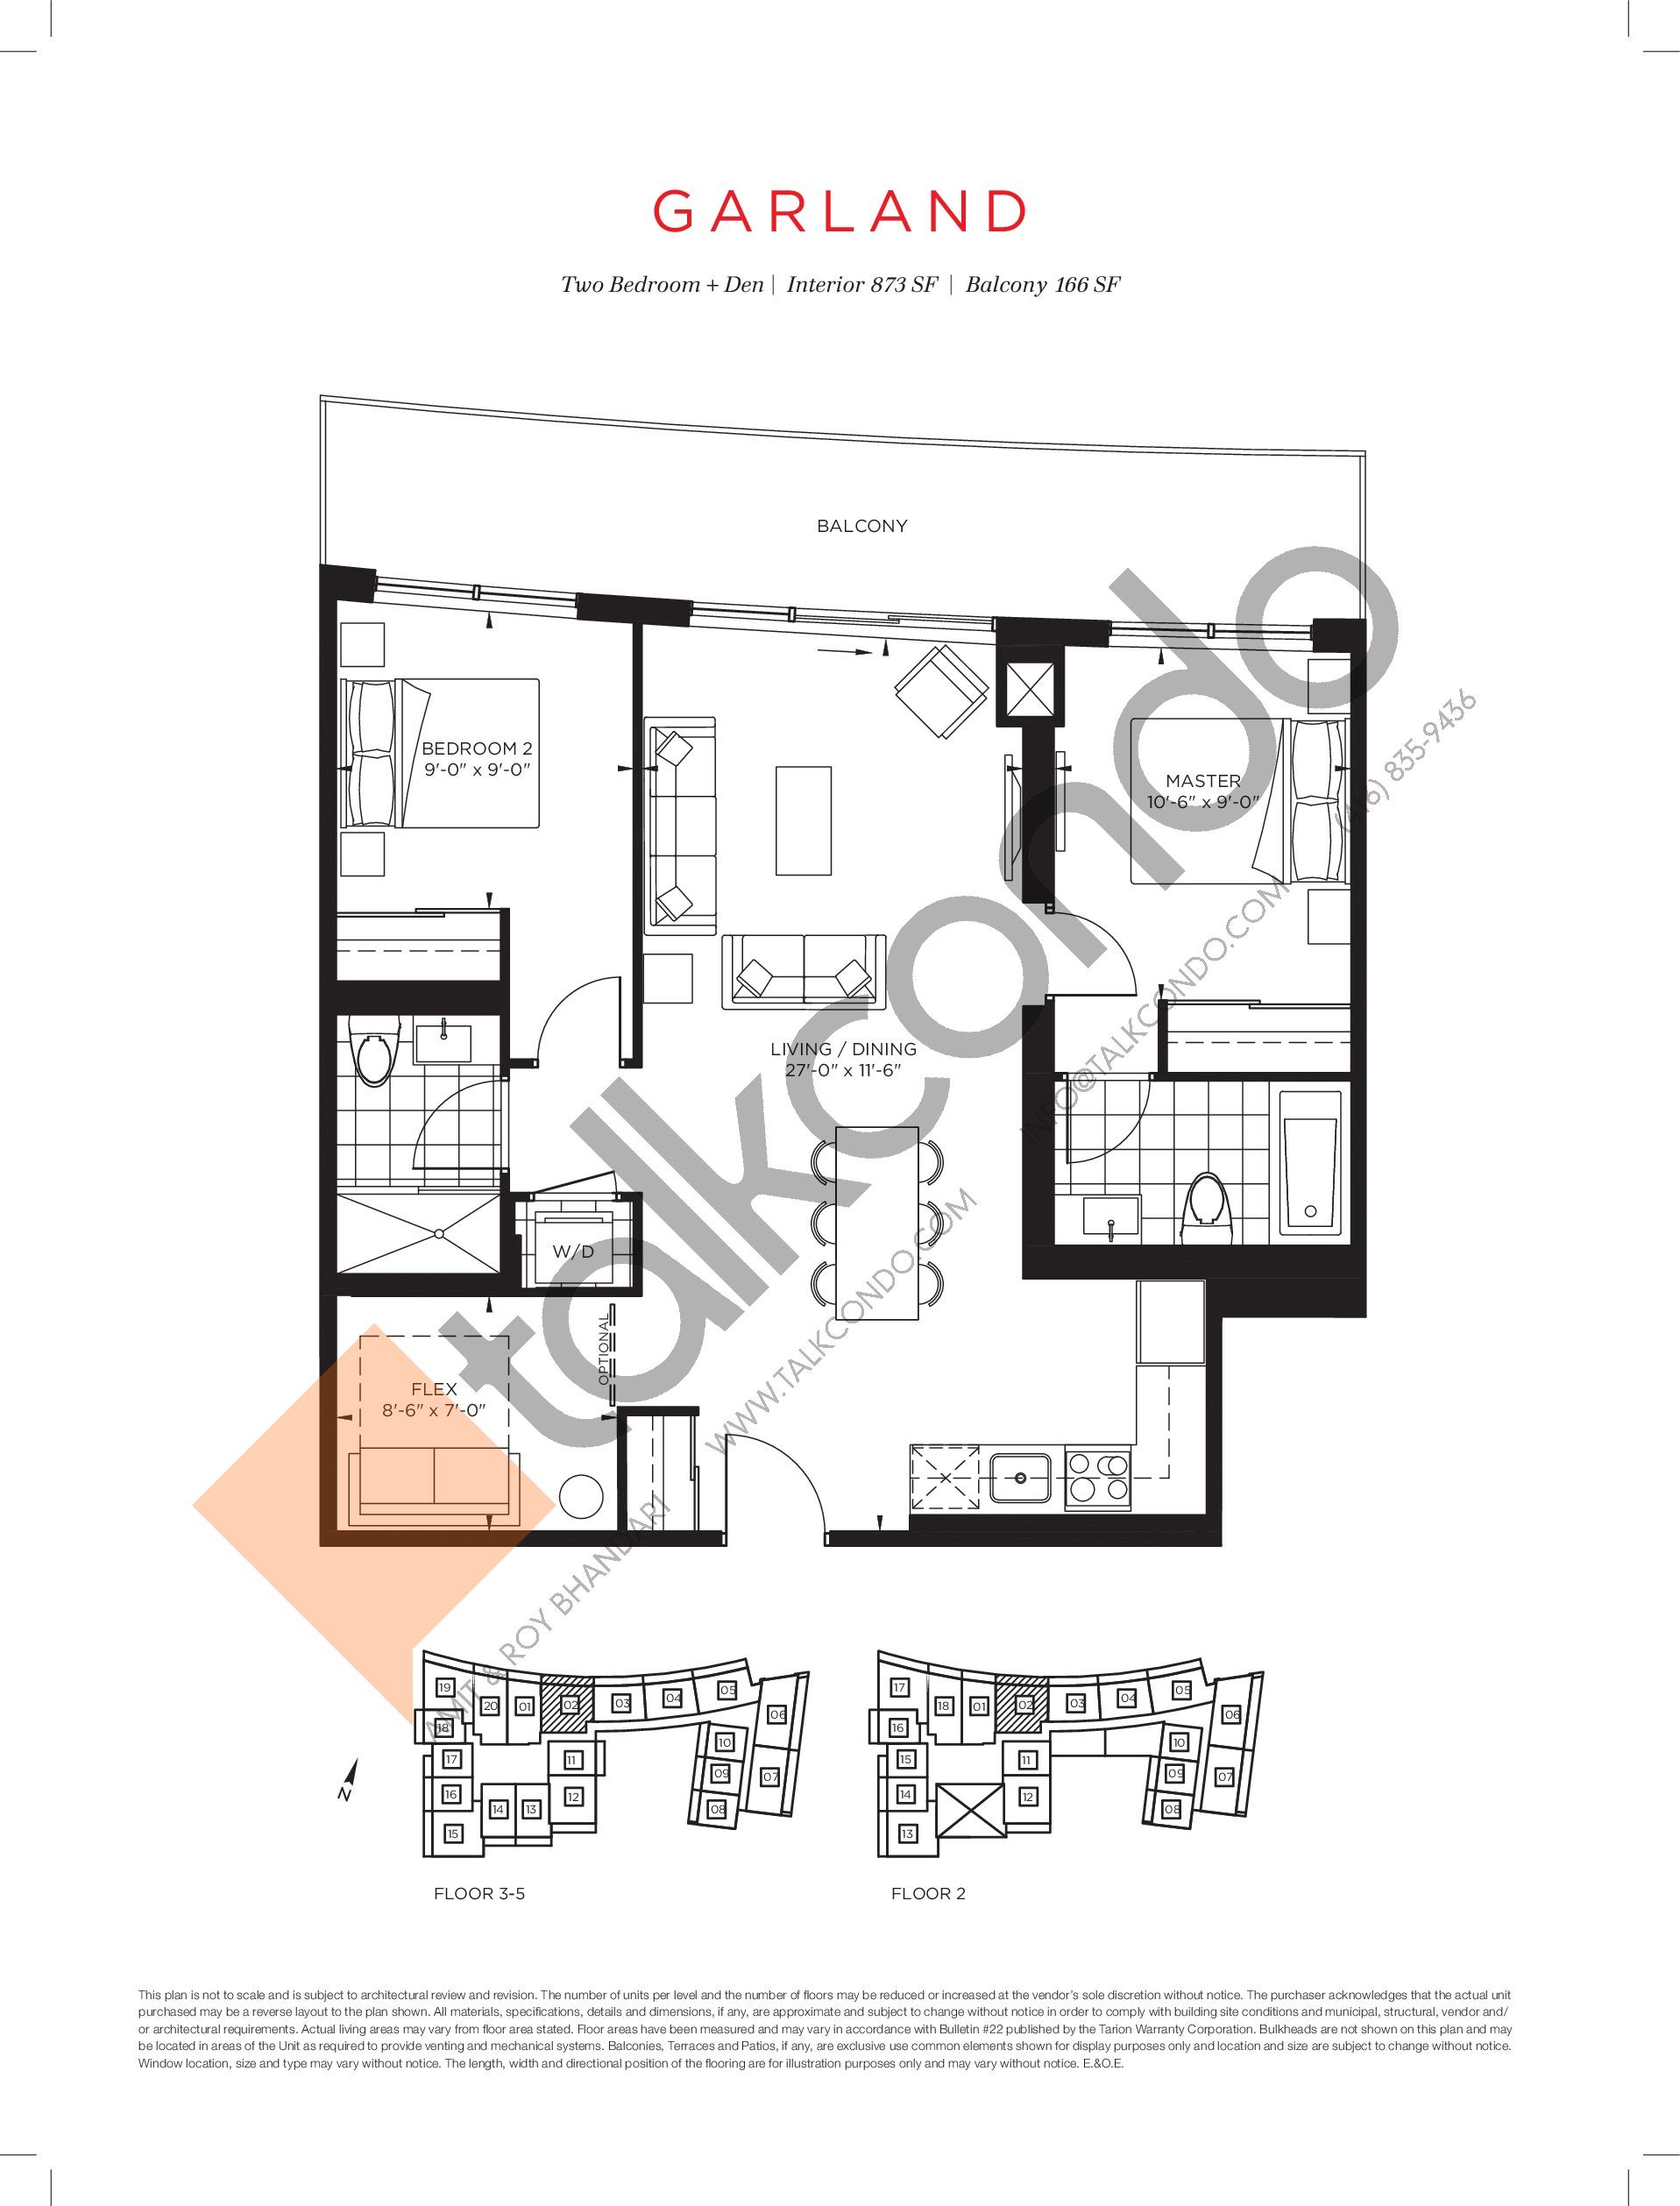 Garland Floor Plan at The Point at Emerald City Condos - 873 sq.ft